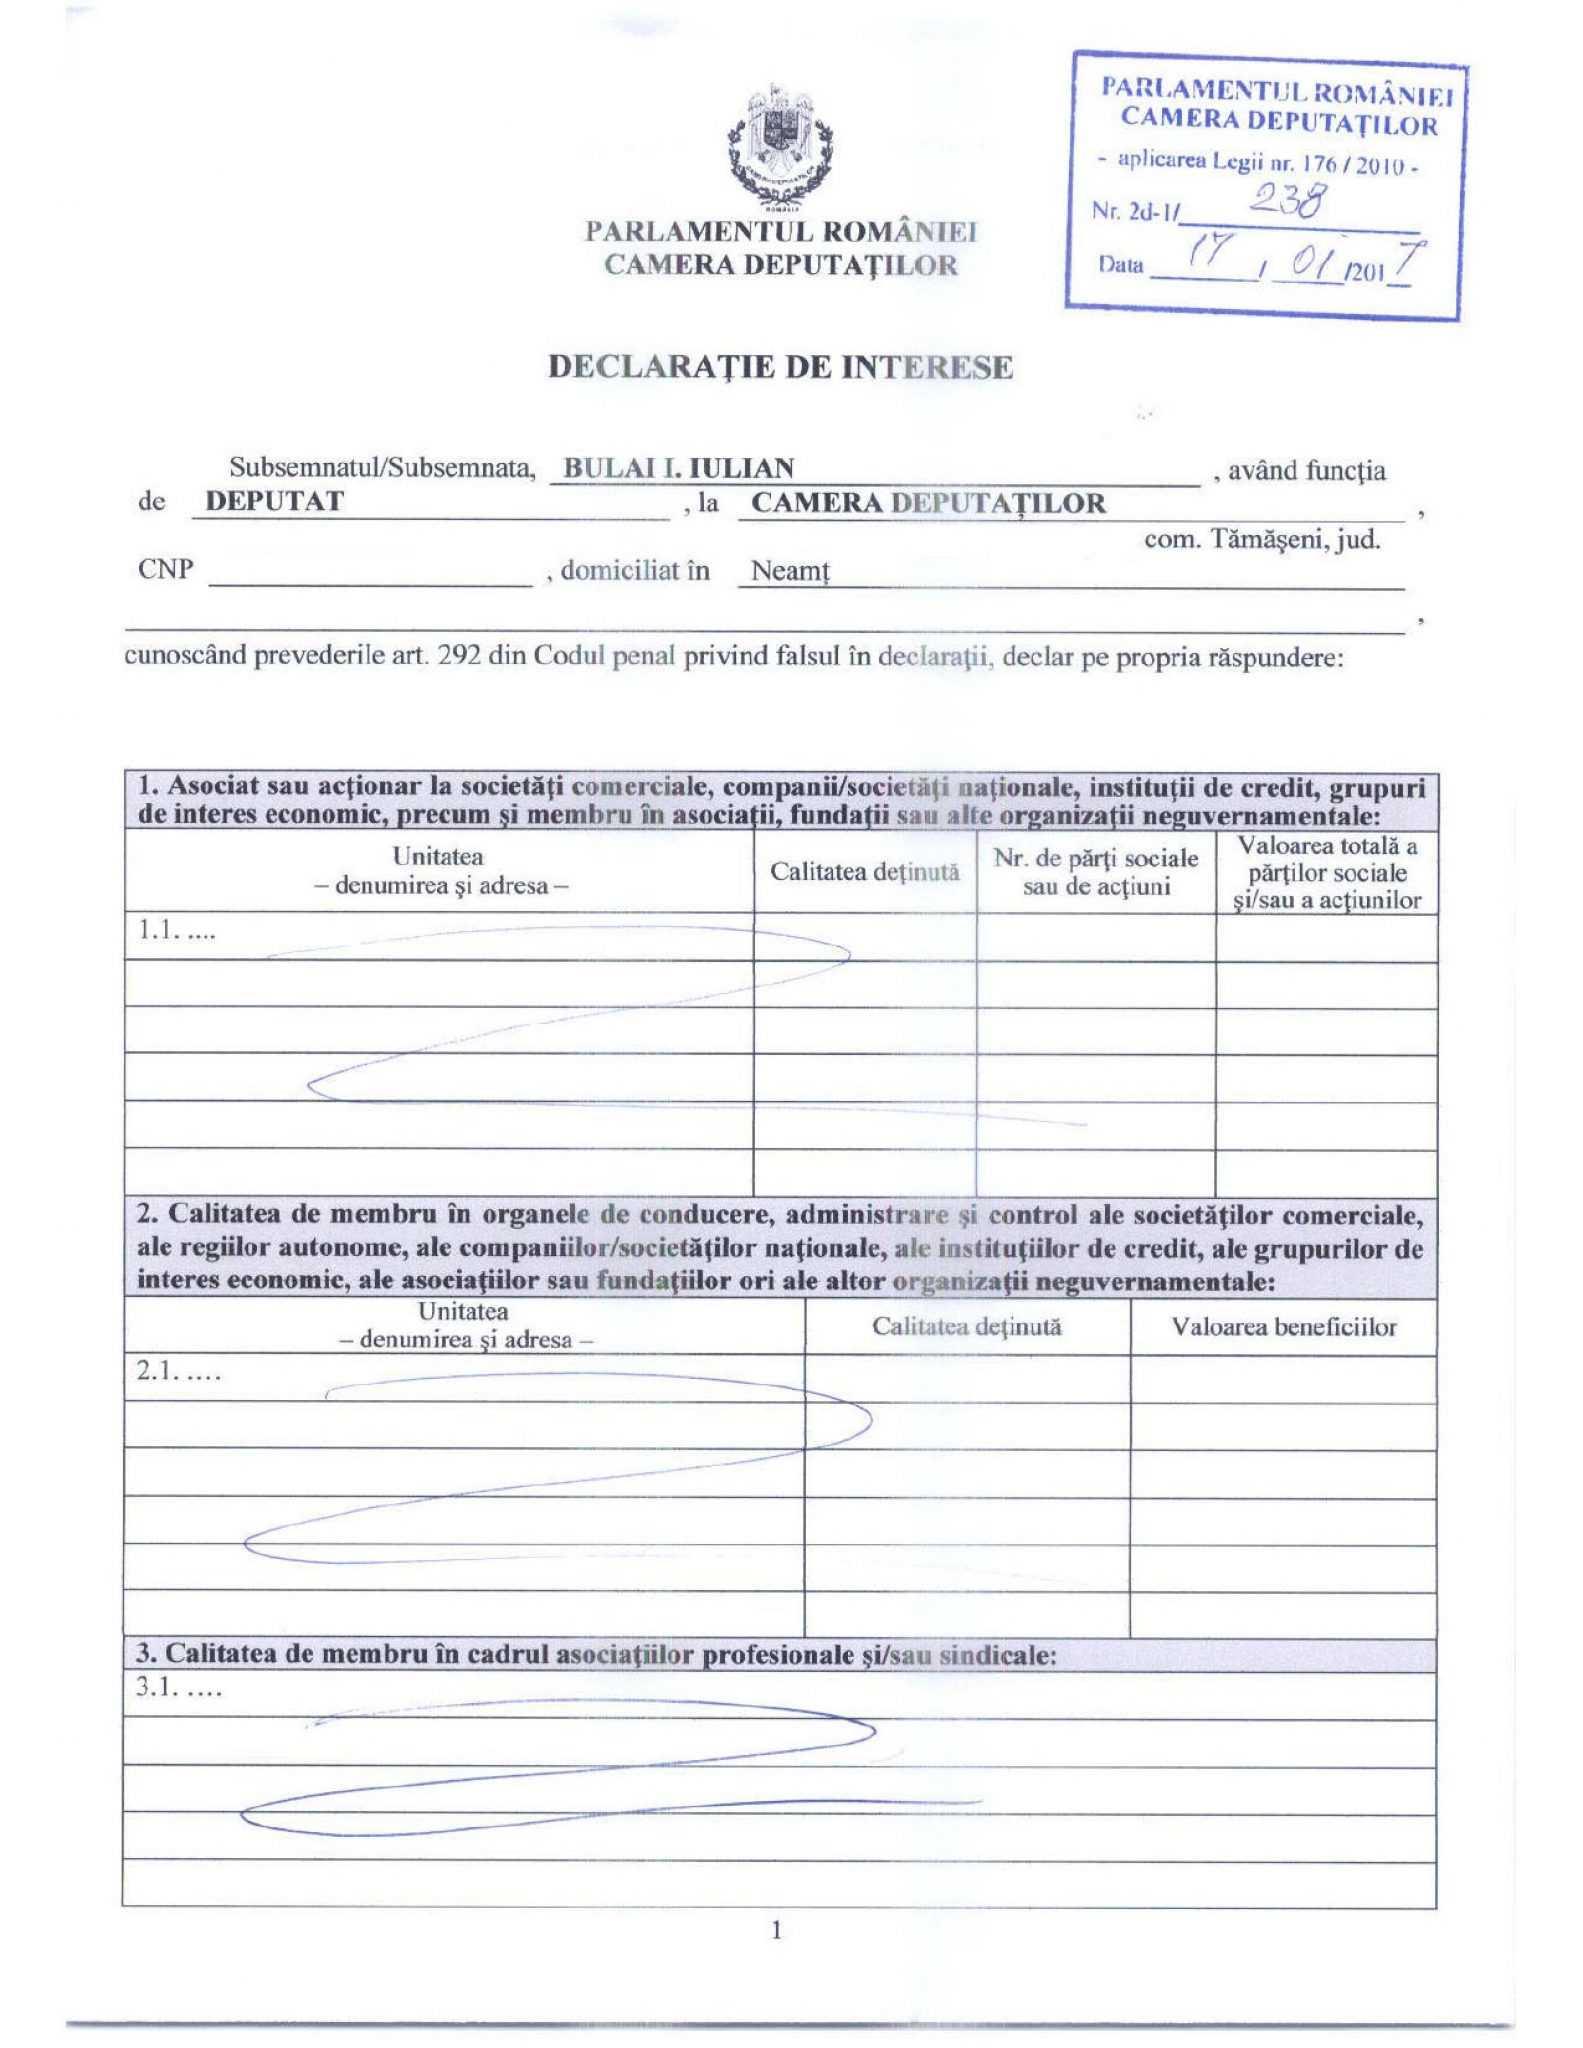 Iulian Bulai - Declaratie de interese-page-001